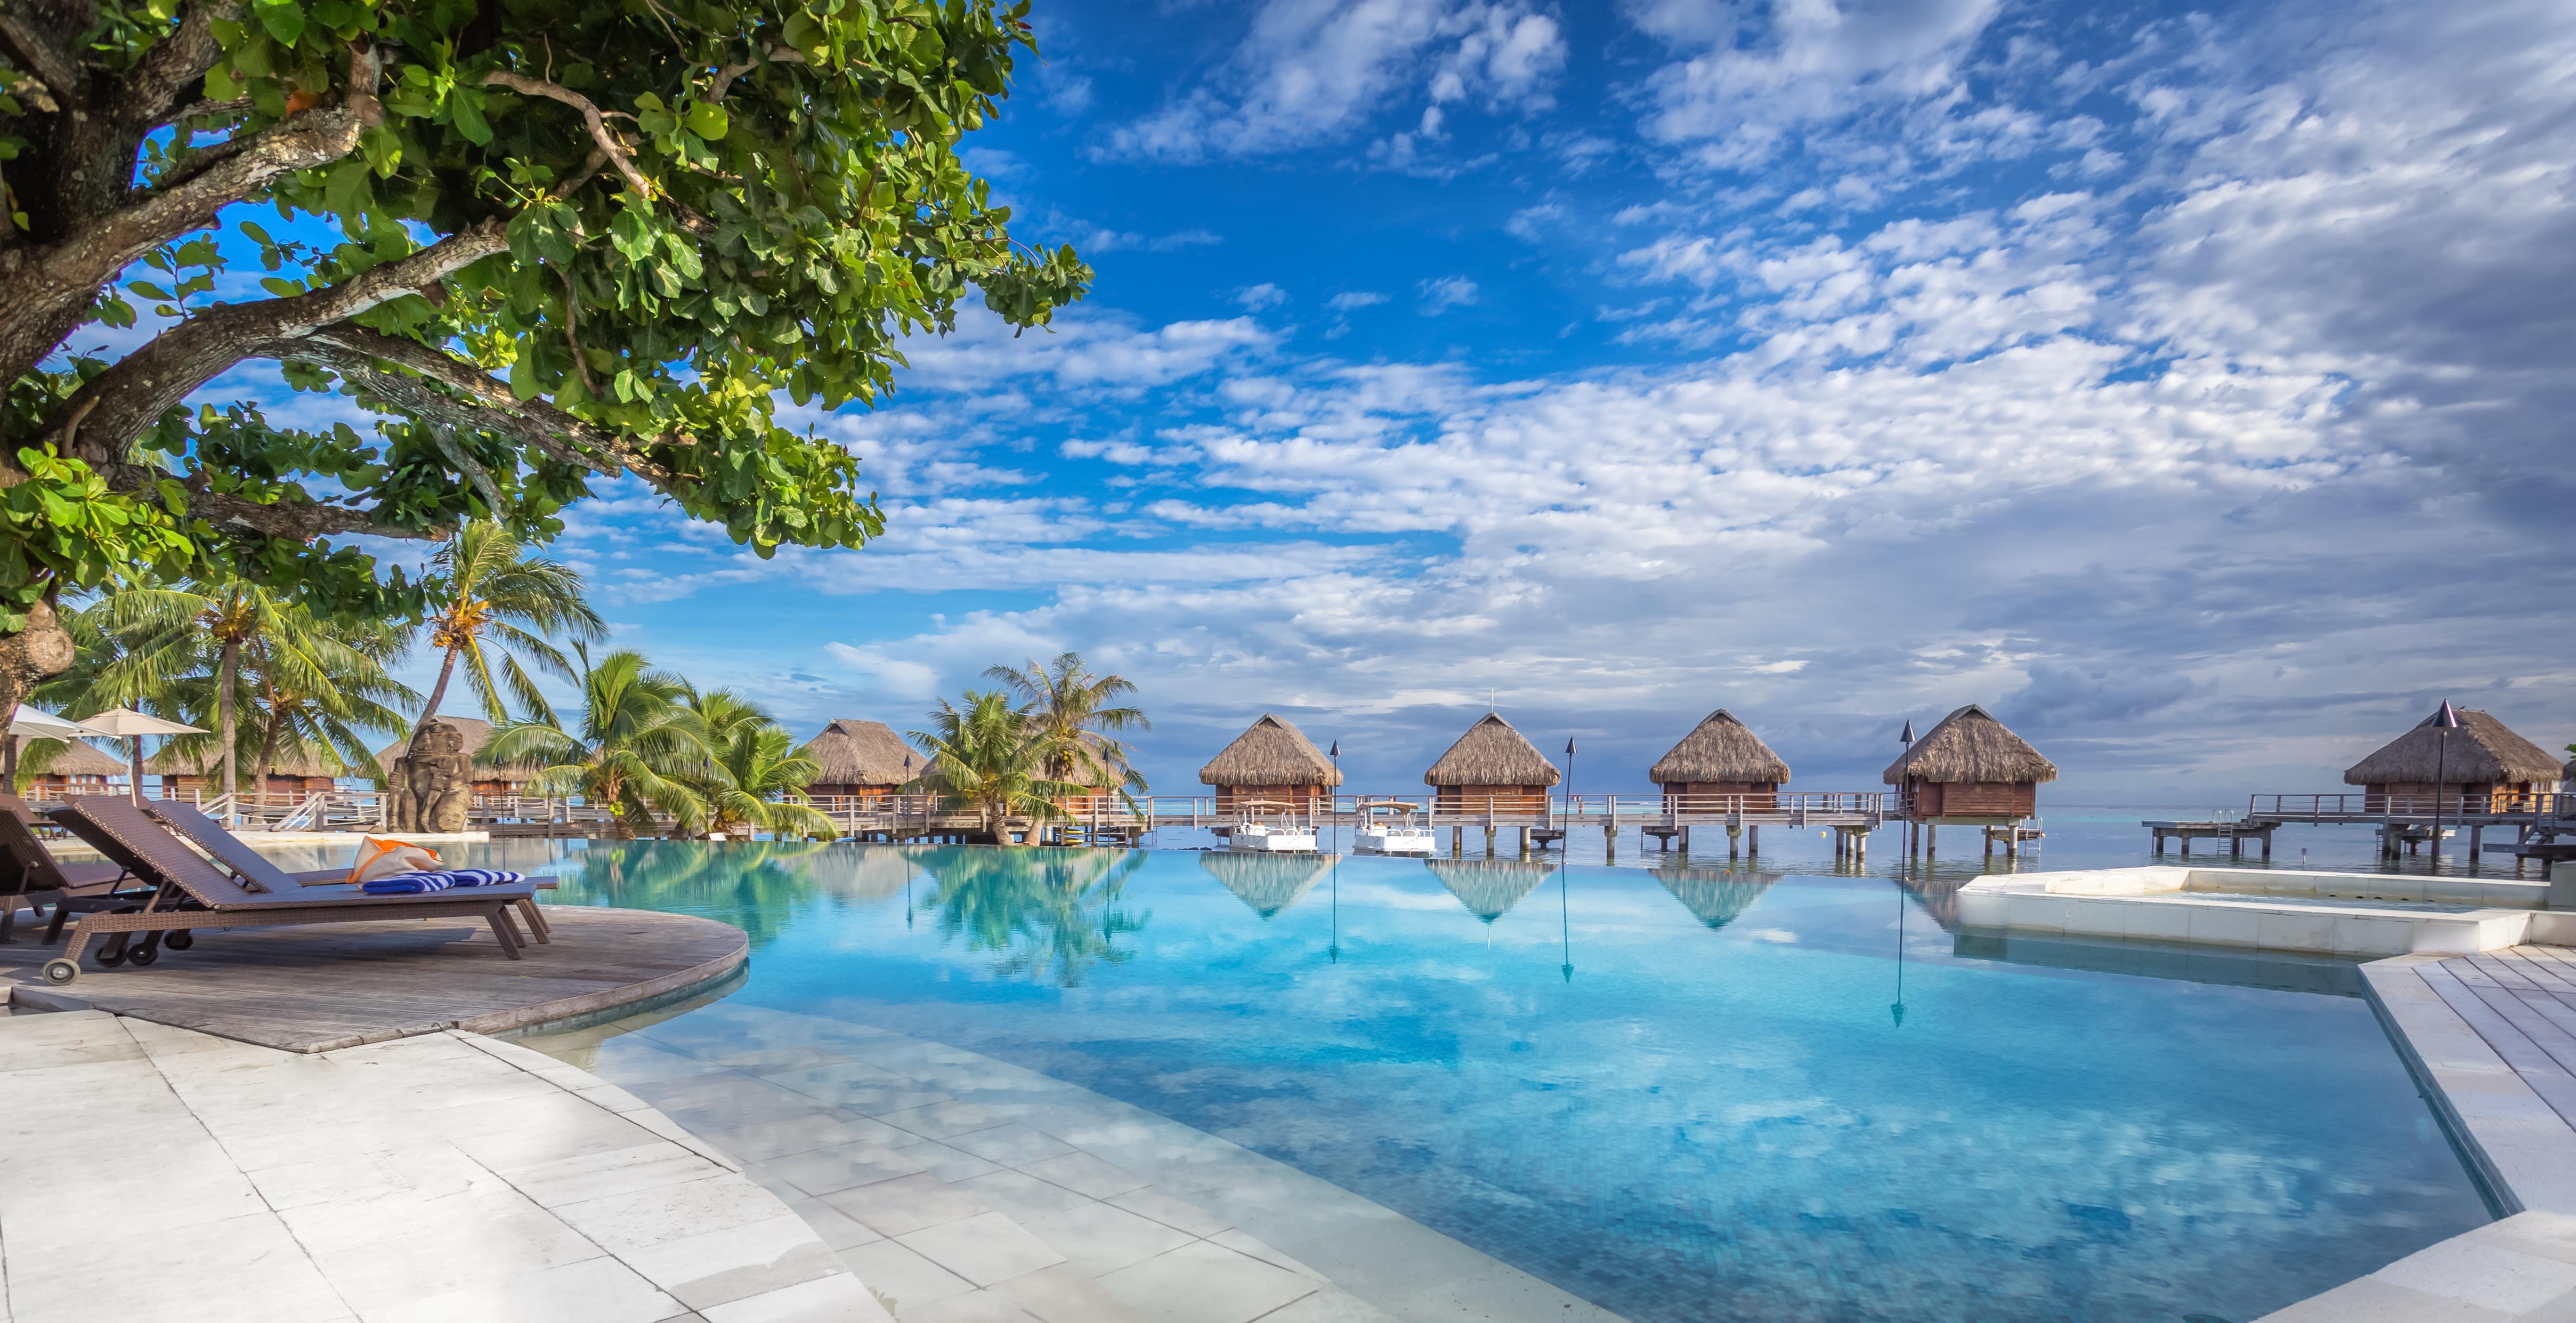 https://tahititourisme.com.au/wp-content/uploads/2017/08/HEBERGEMENT-Manava-Beach-Resort-and-Spa-Moorea-1-Charles_Veronese.jpg